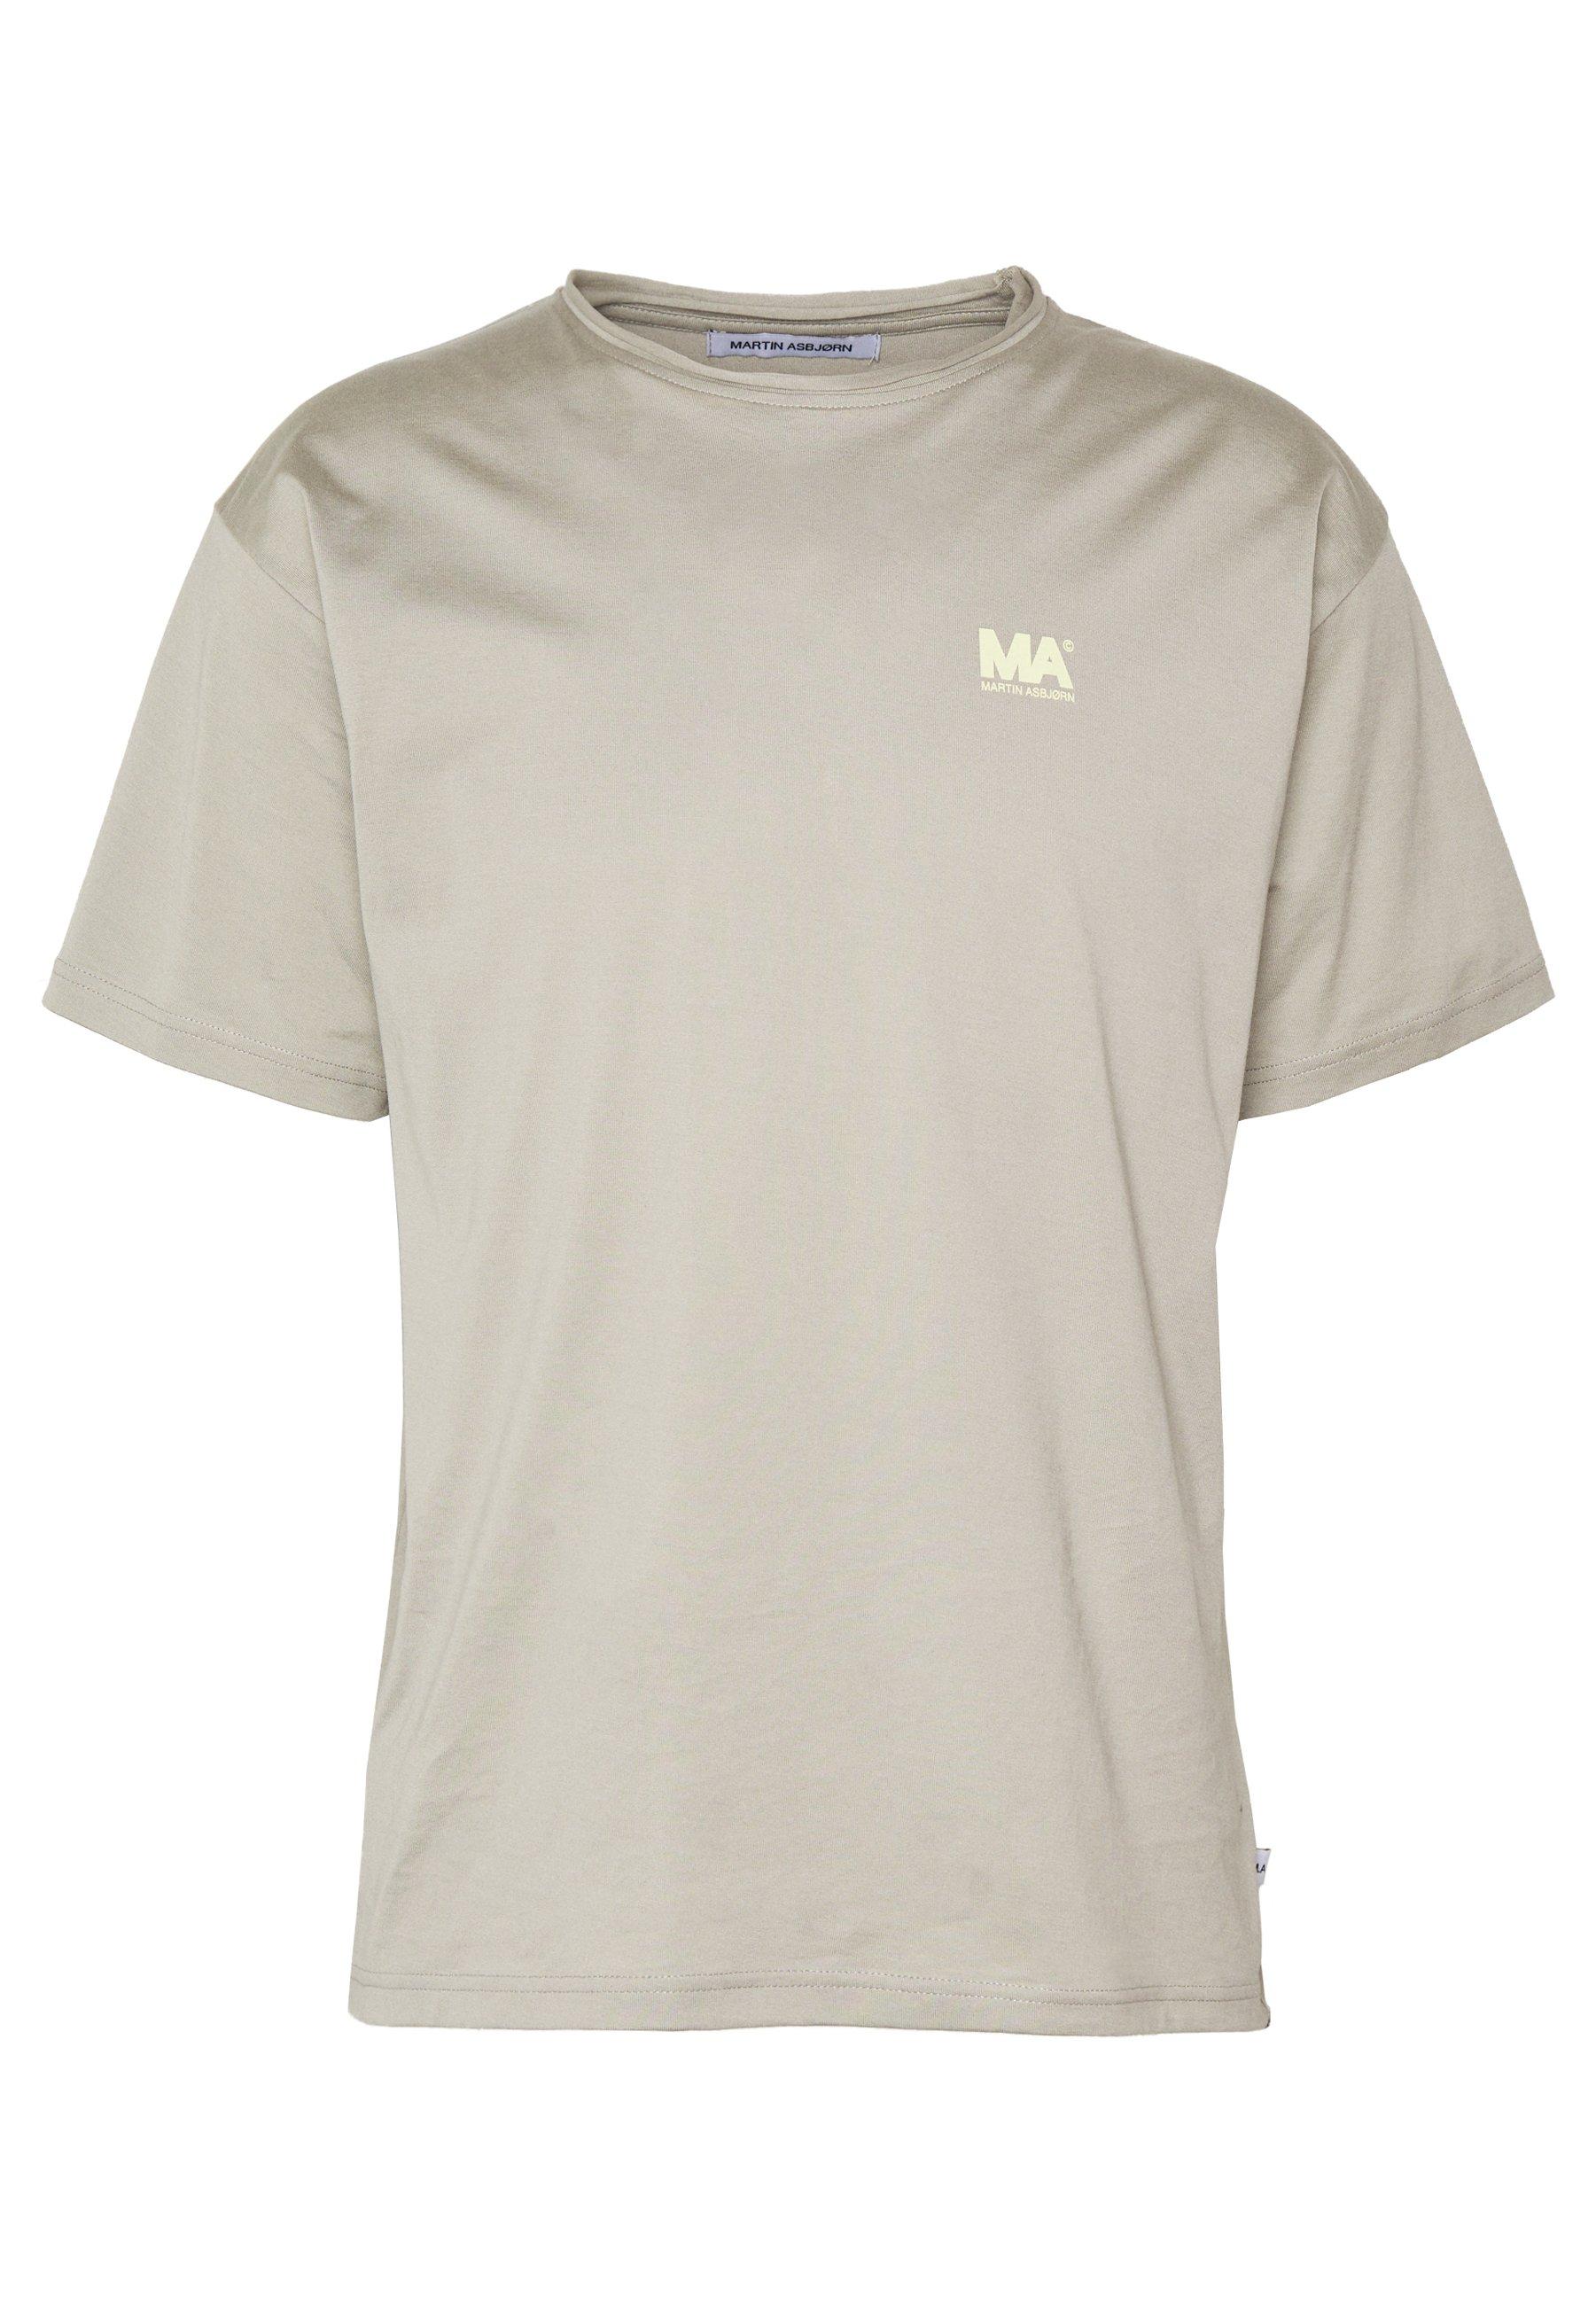 Martin Asbjørn Greg Tee - T-shirt Med Print Stone Grey